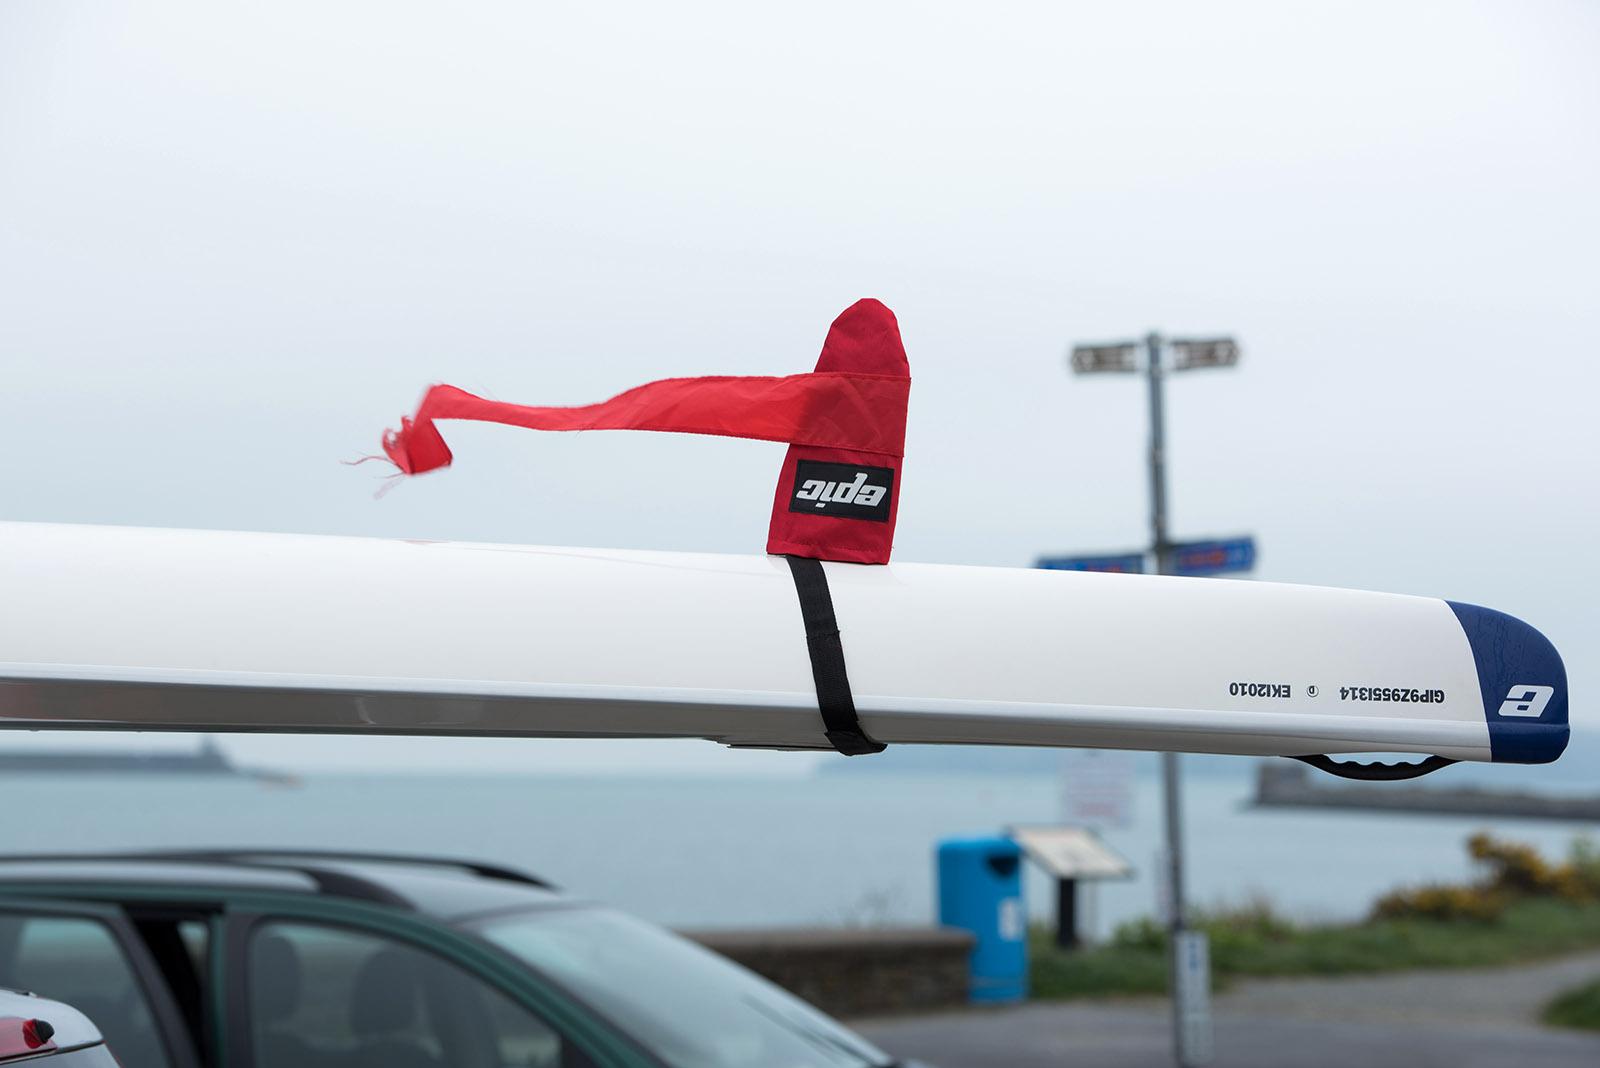 FBOR'18 Wind Sock